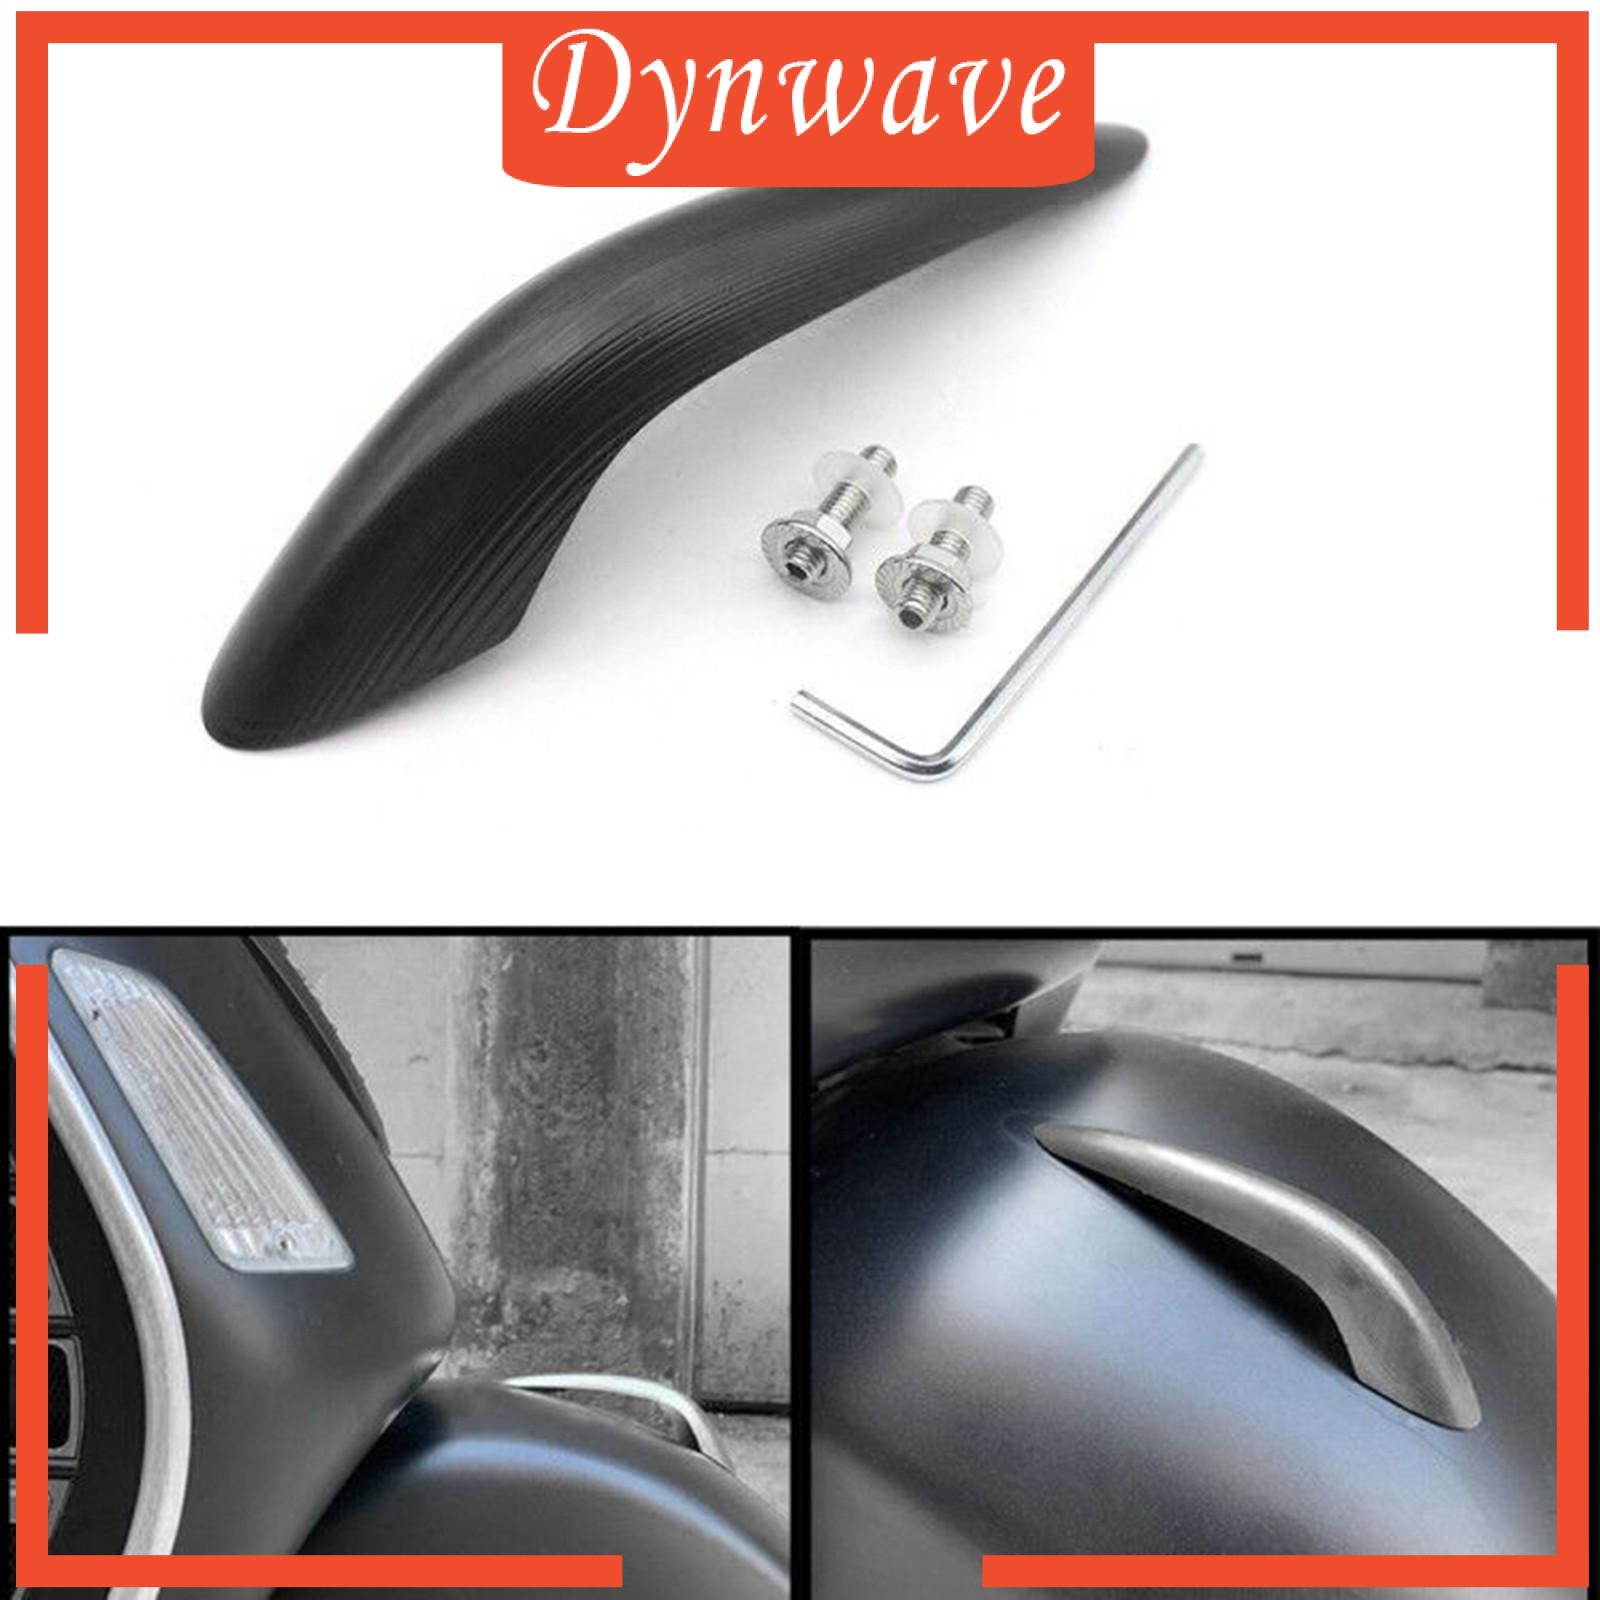 FENDER [Dynwave] 用於 Vespa Gts Gtv 250300 的 Cnc 鋁前擋泥板擋泥板鼻喙